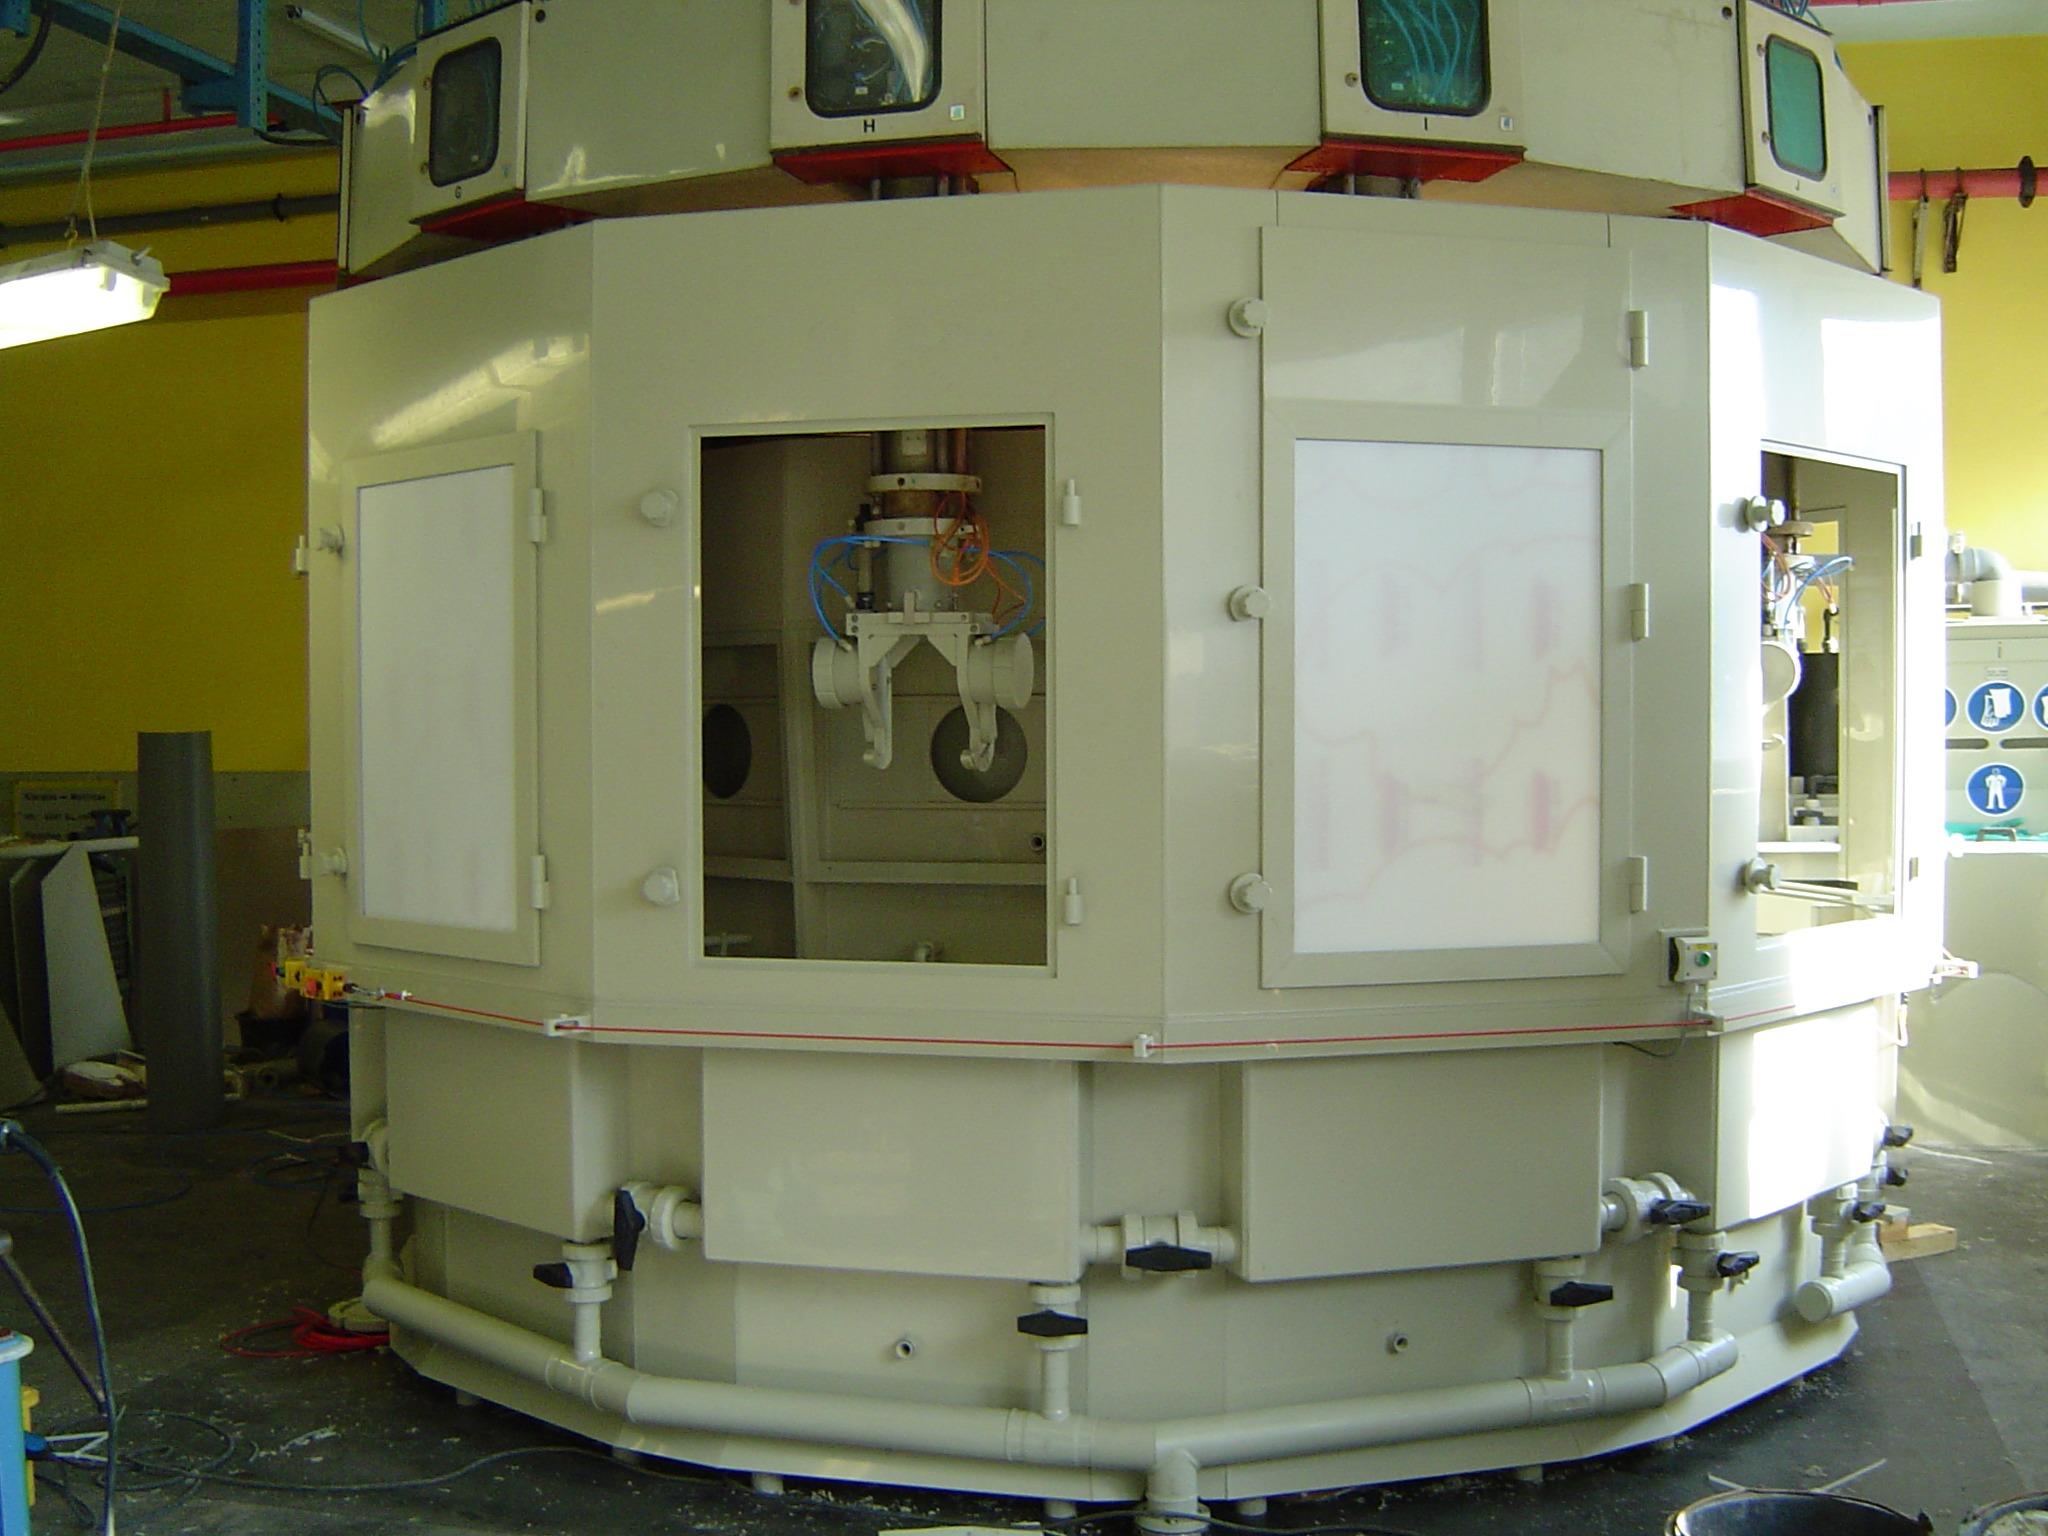 Apparate-DSC00283